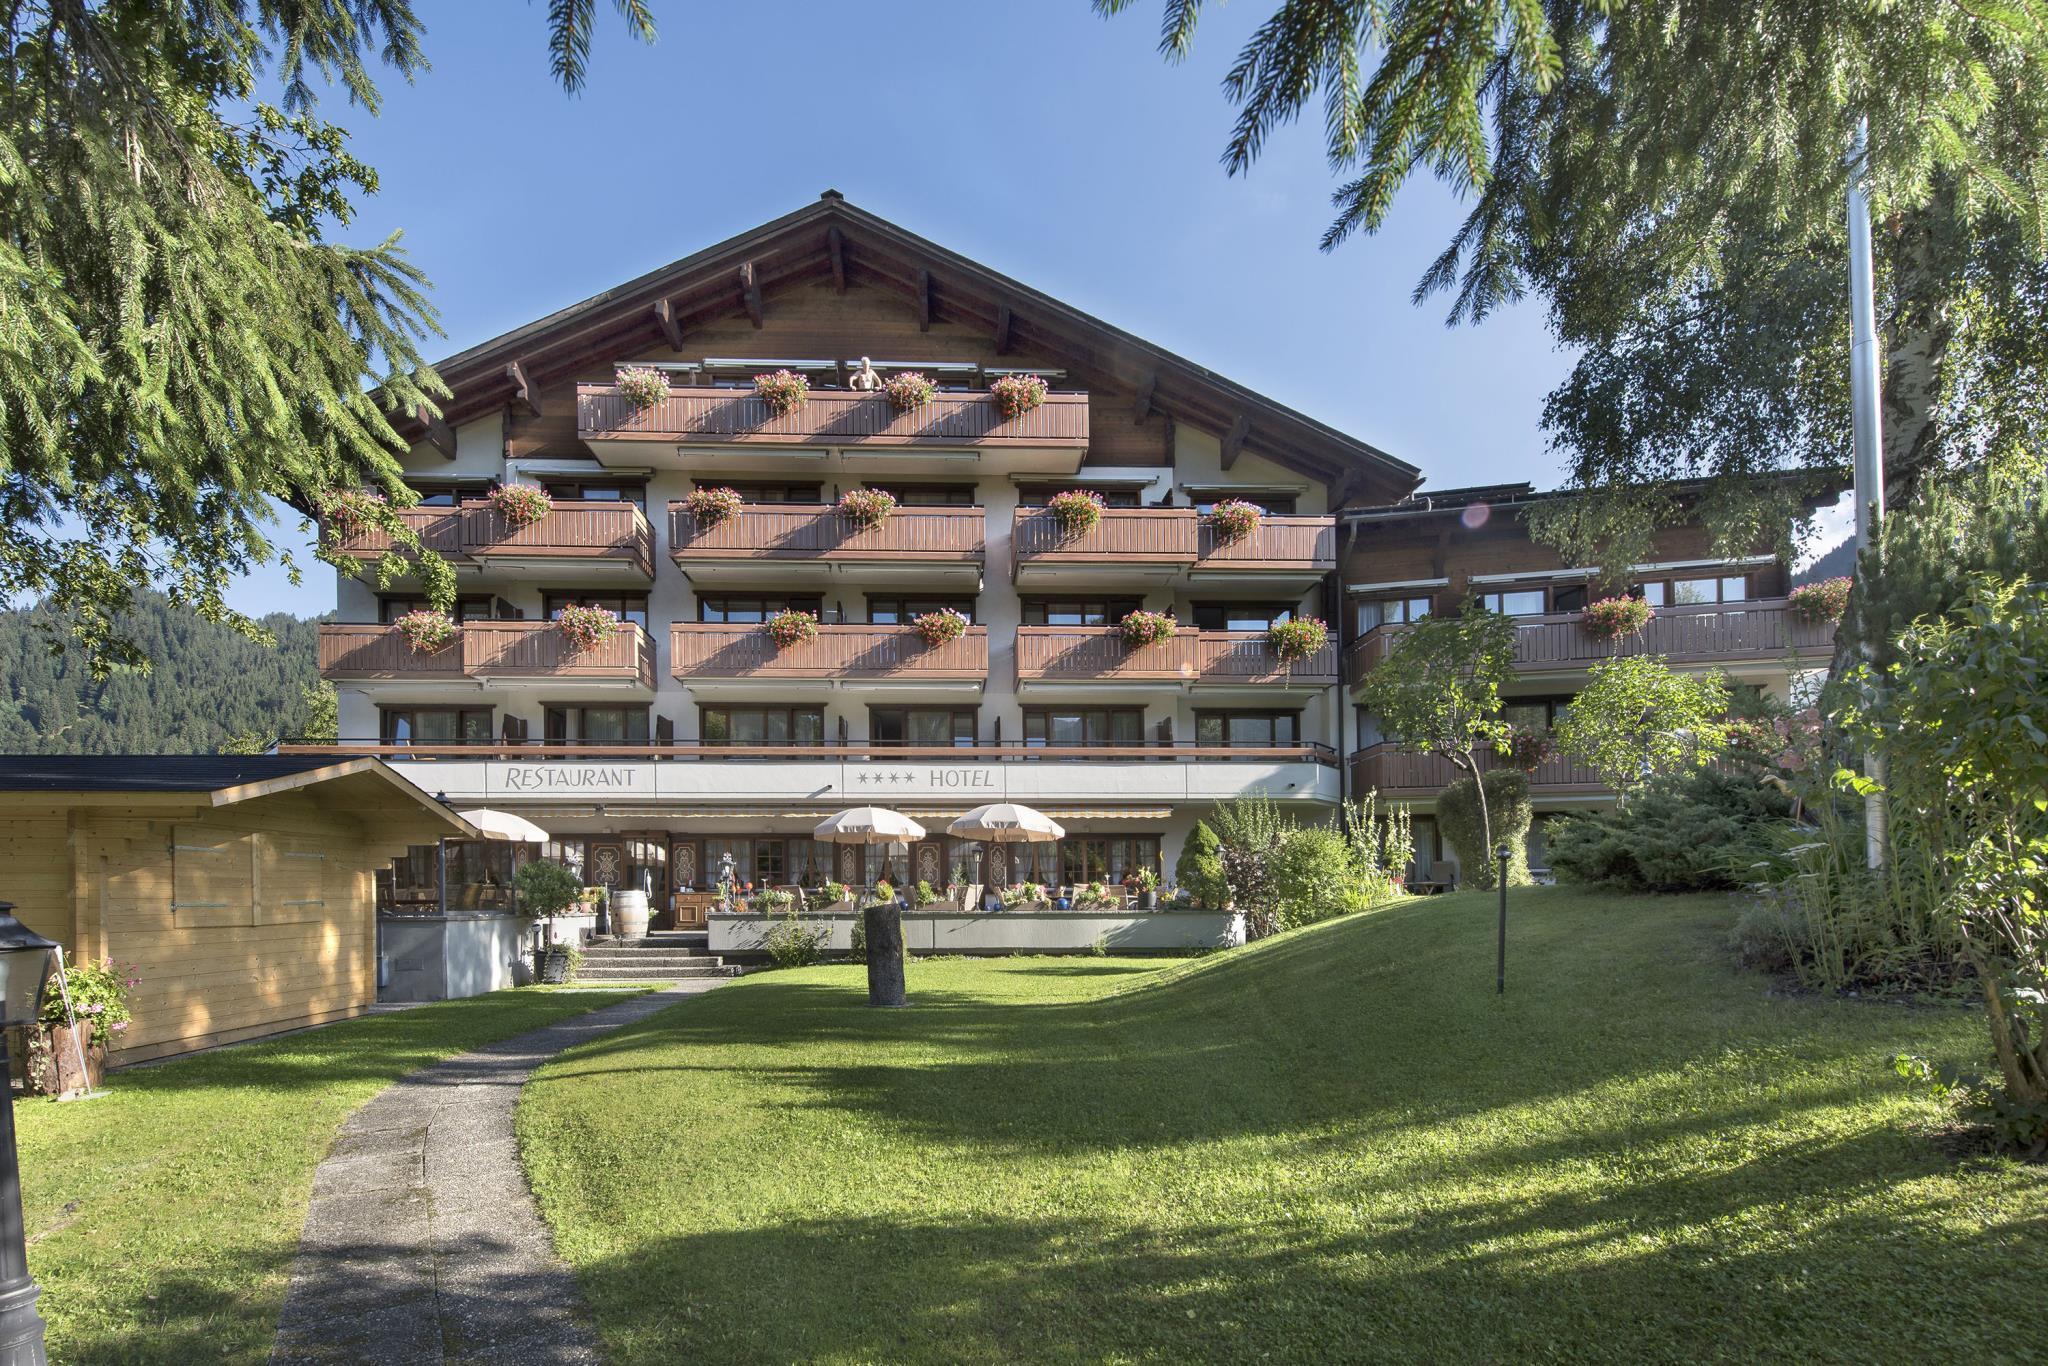 Deals On Sunstar Hotel Klosters In Switzerland Promotional Room